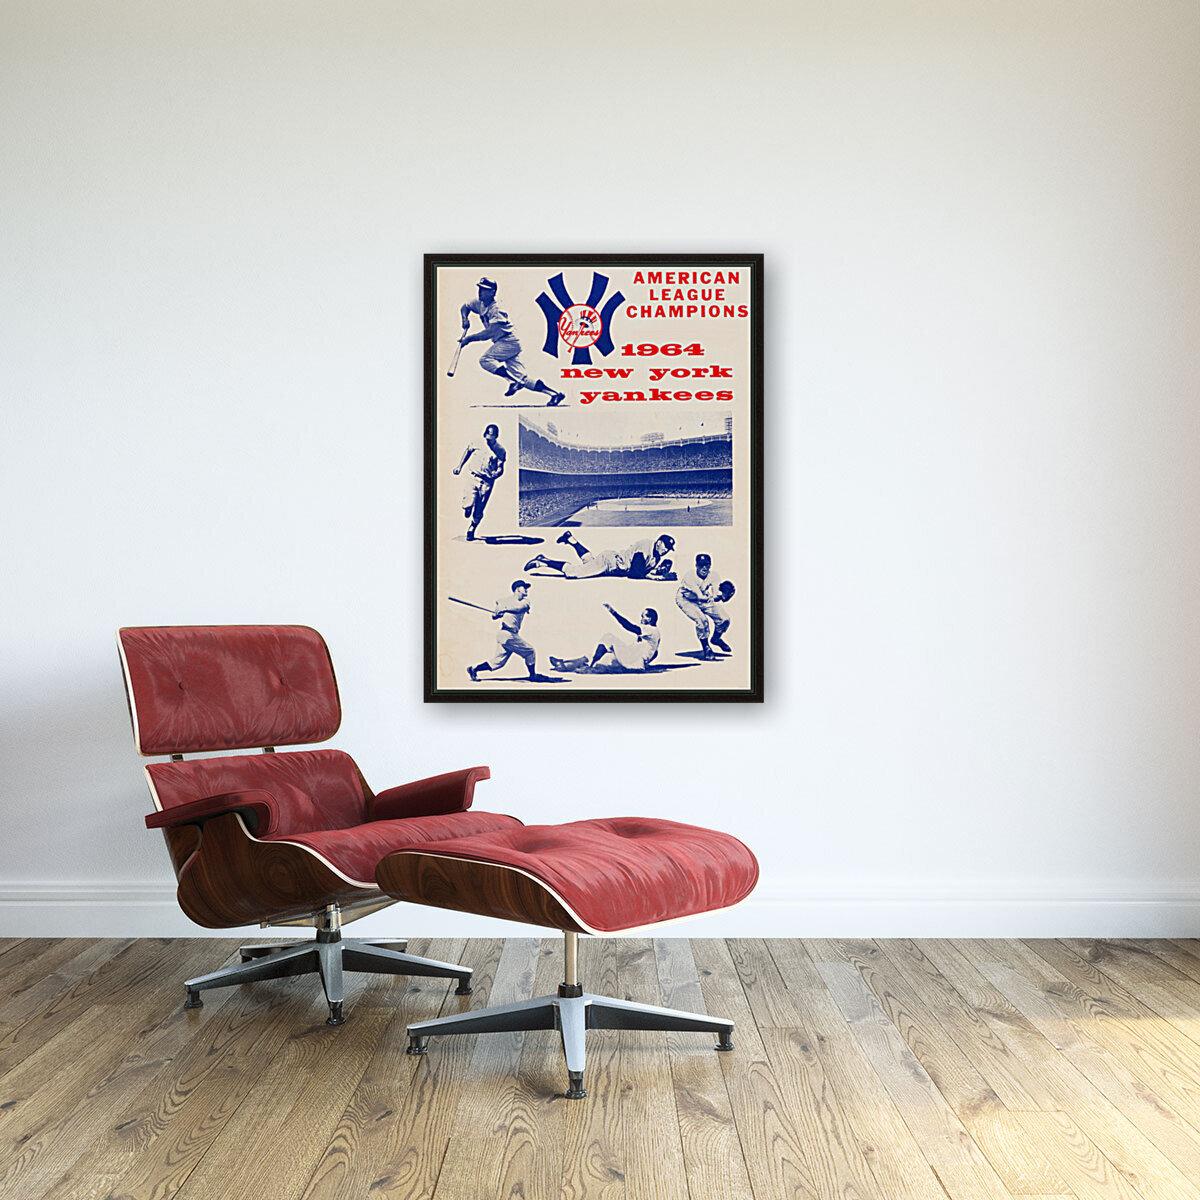 1964 new york yankees american league champions poster  Art